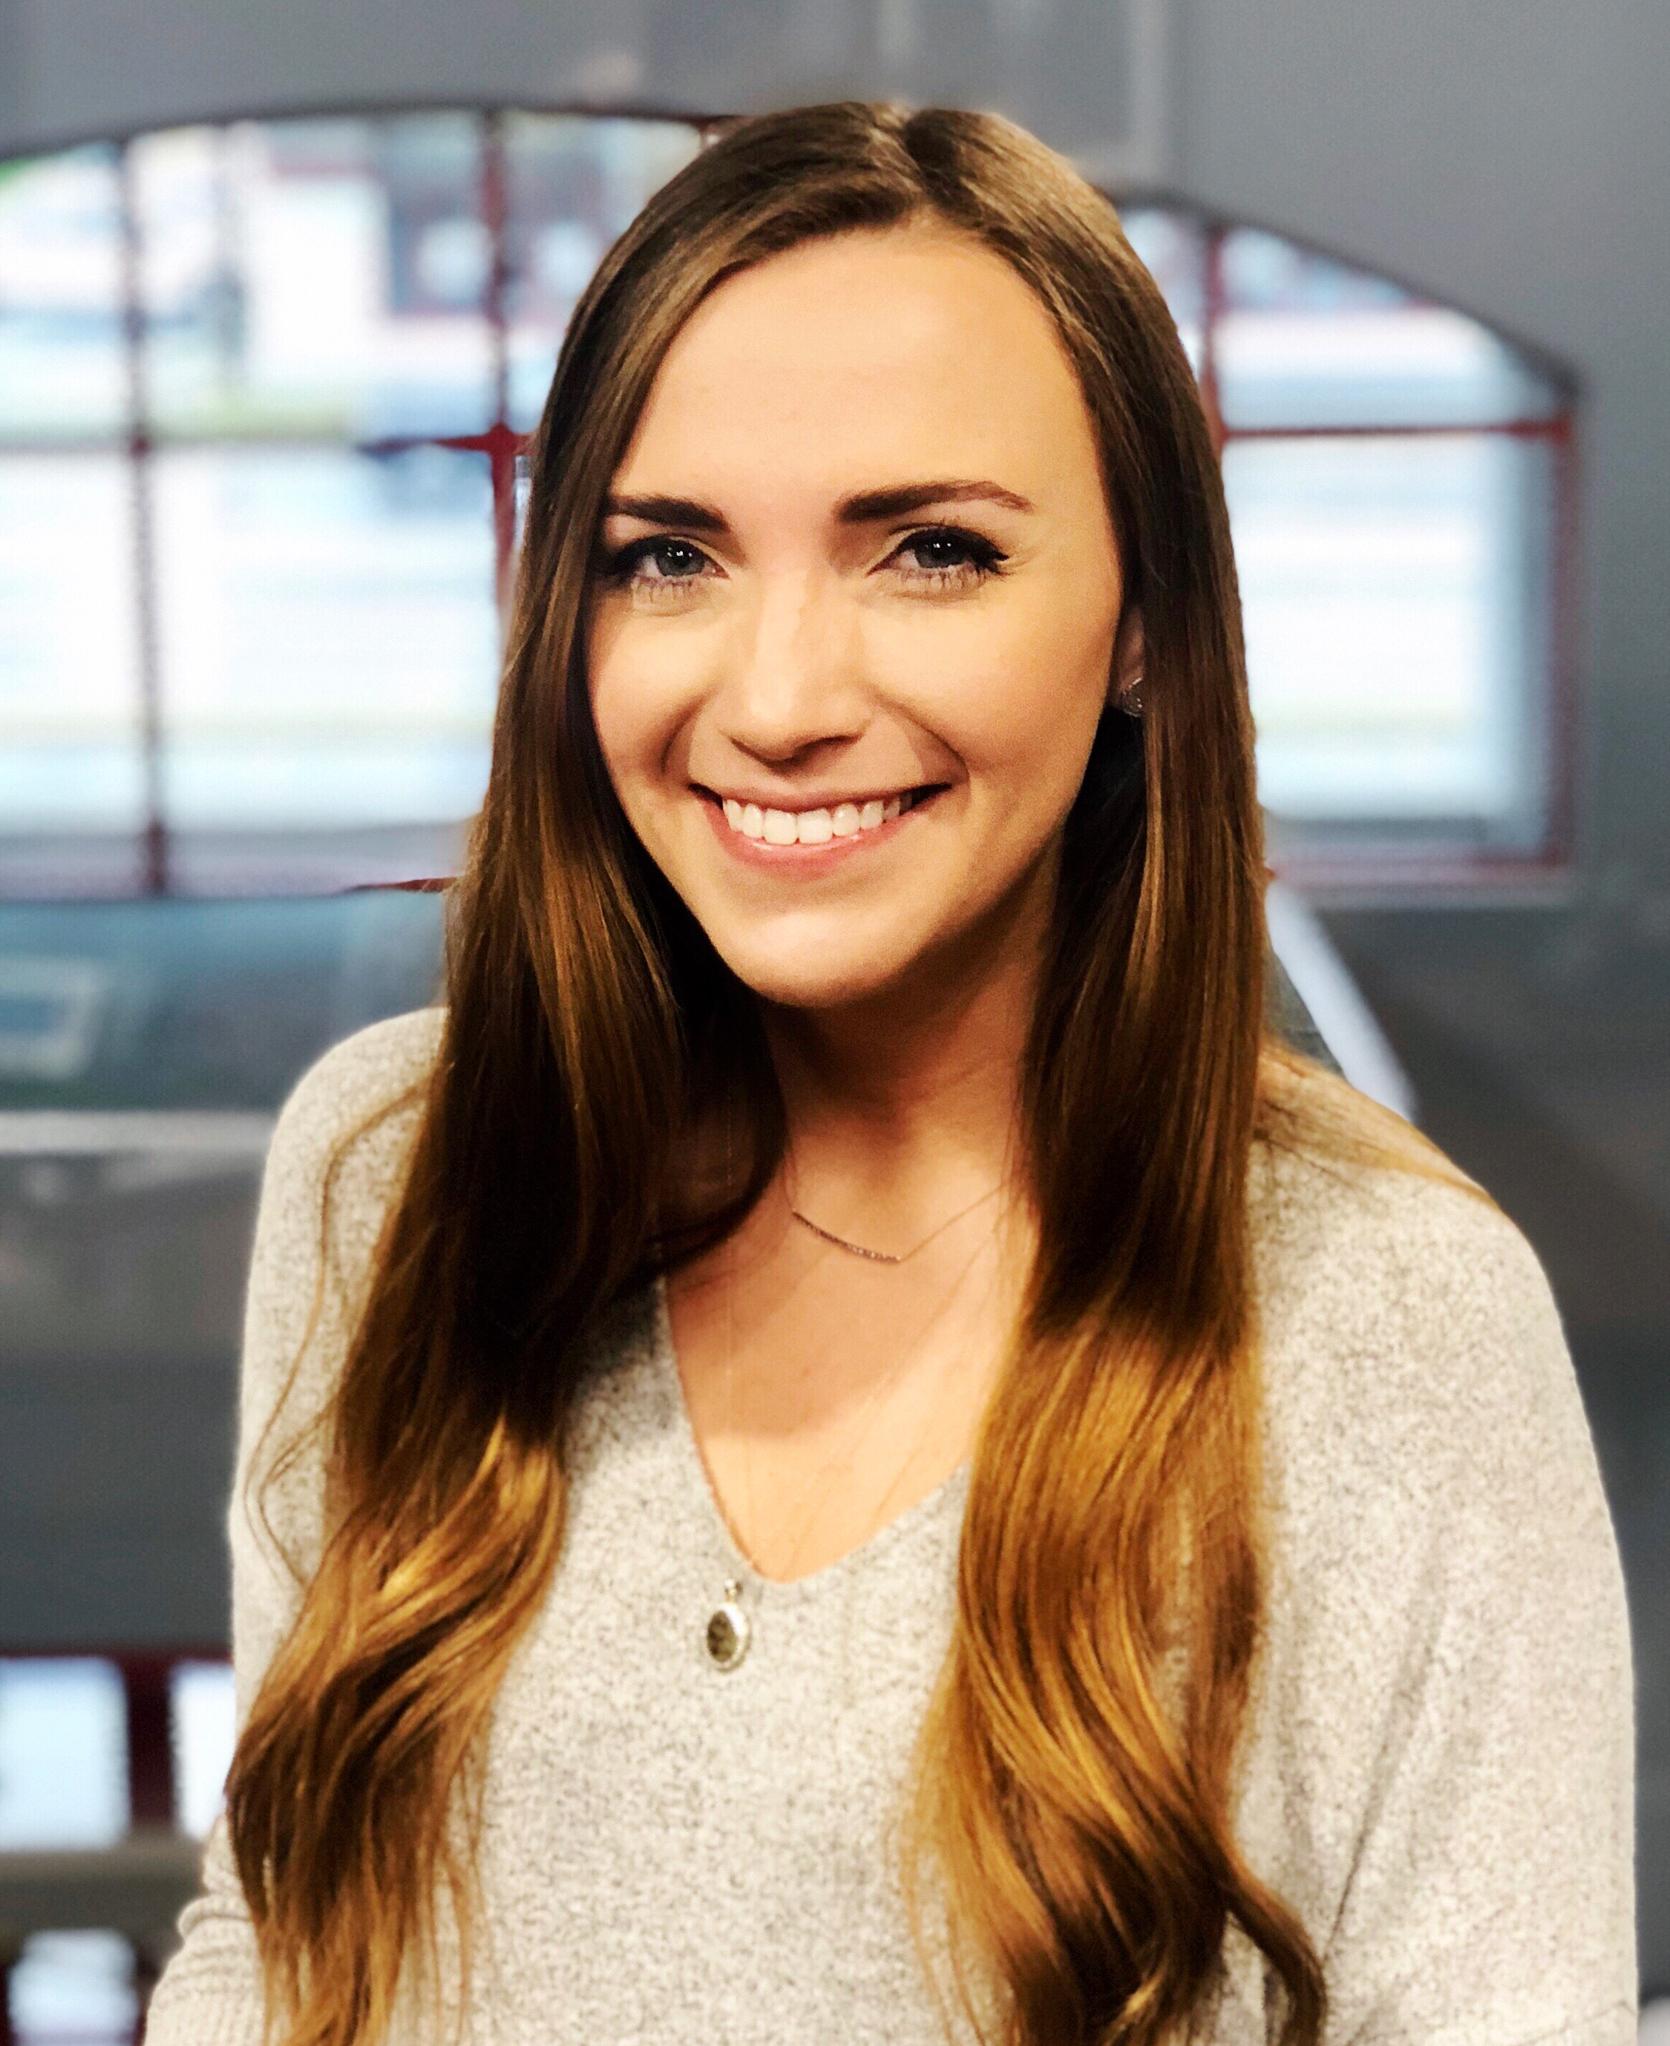 Sara Rowell